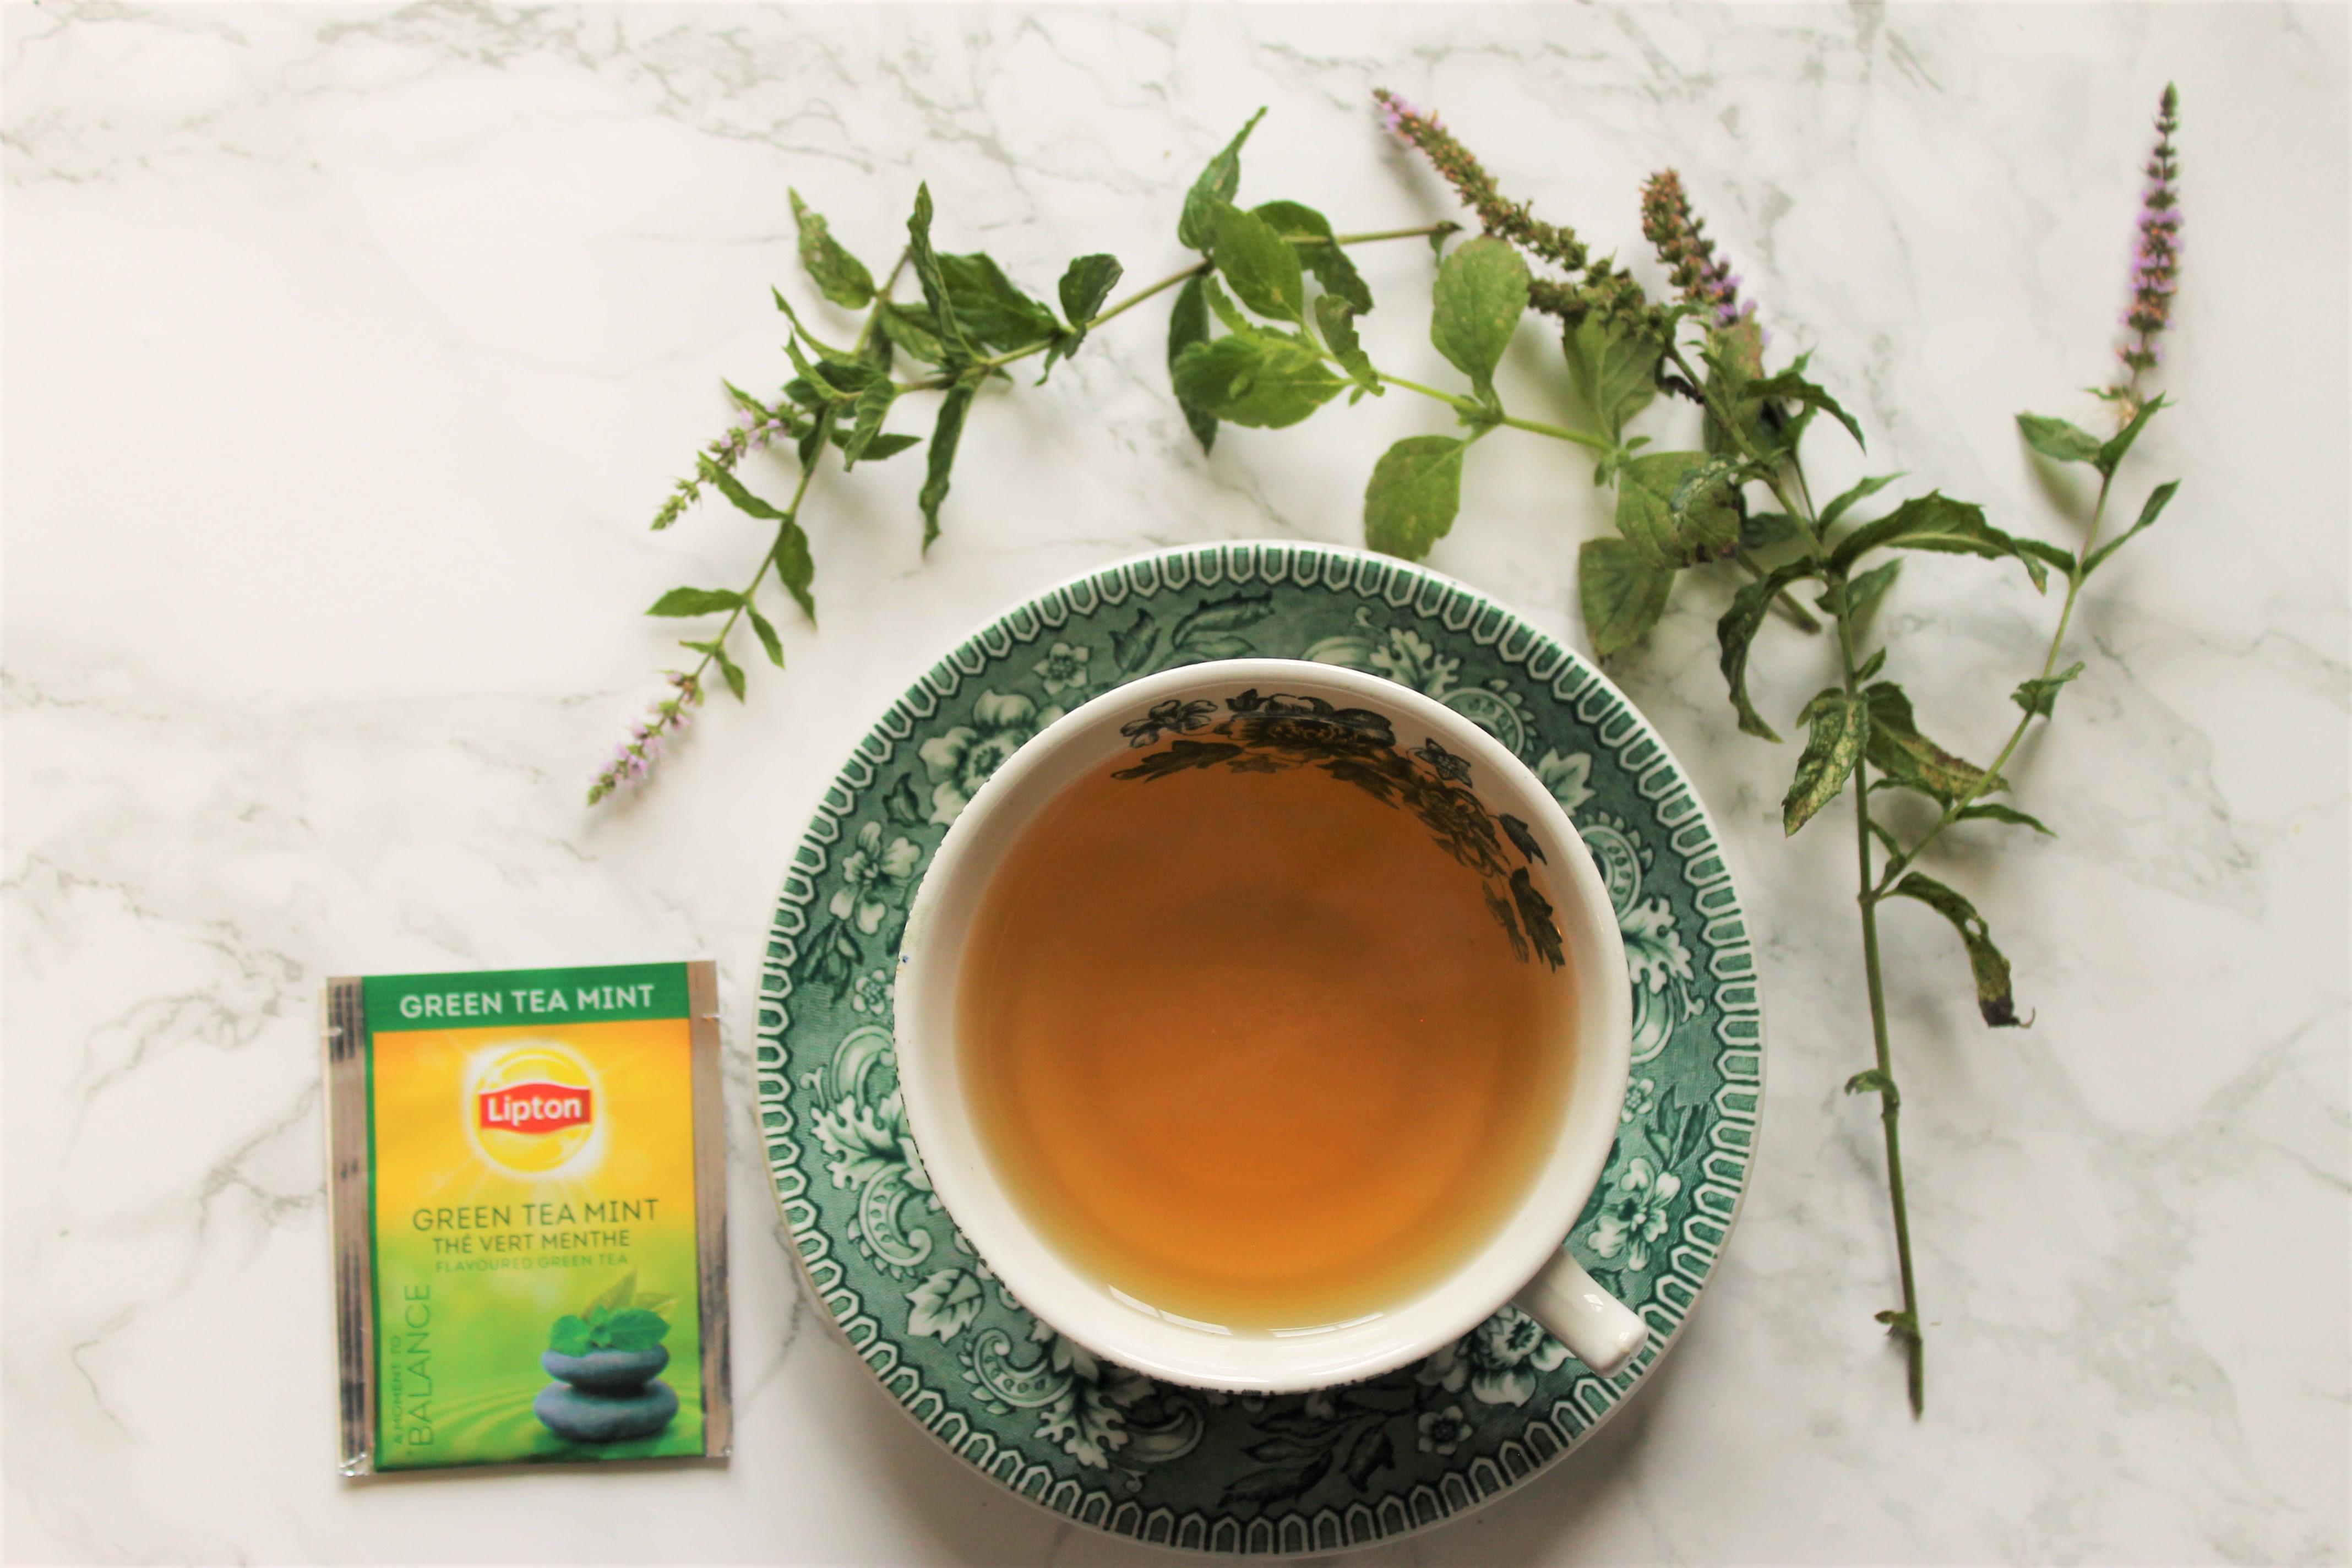 Lipton Green Tea Mint Tea Review